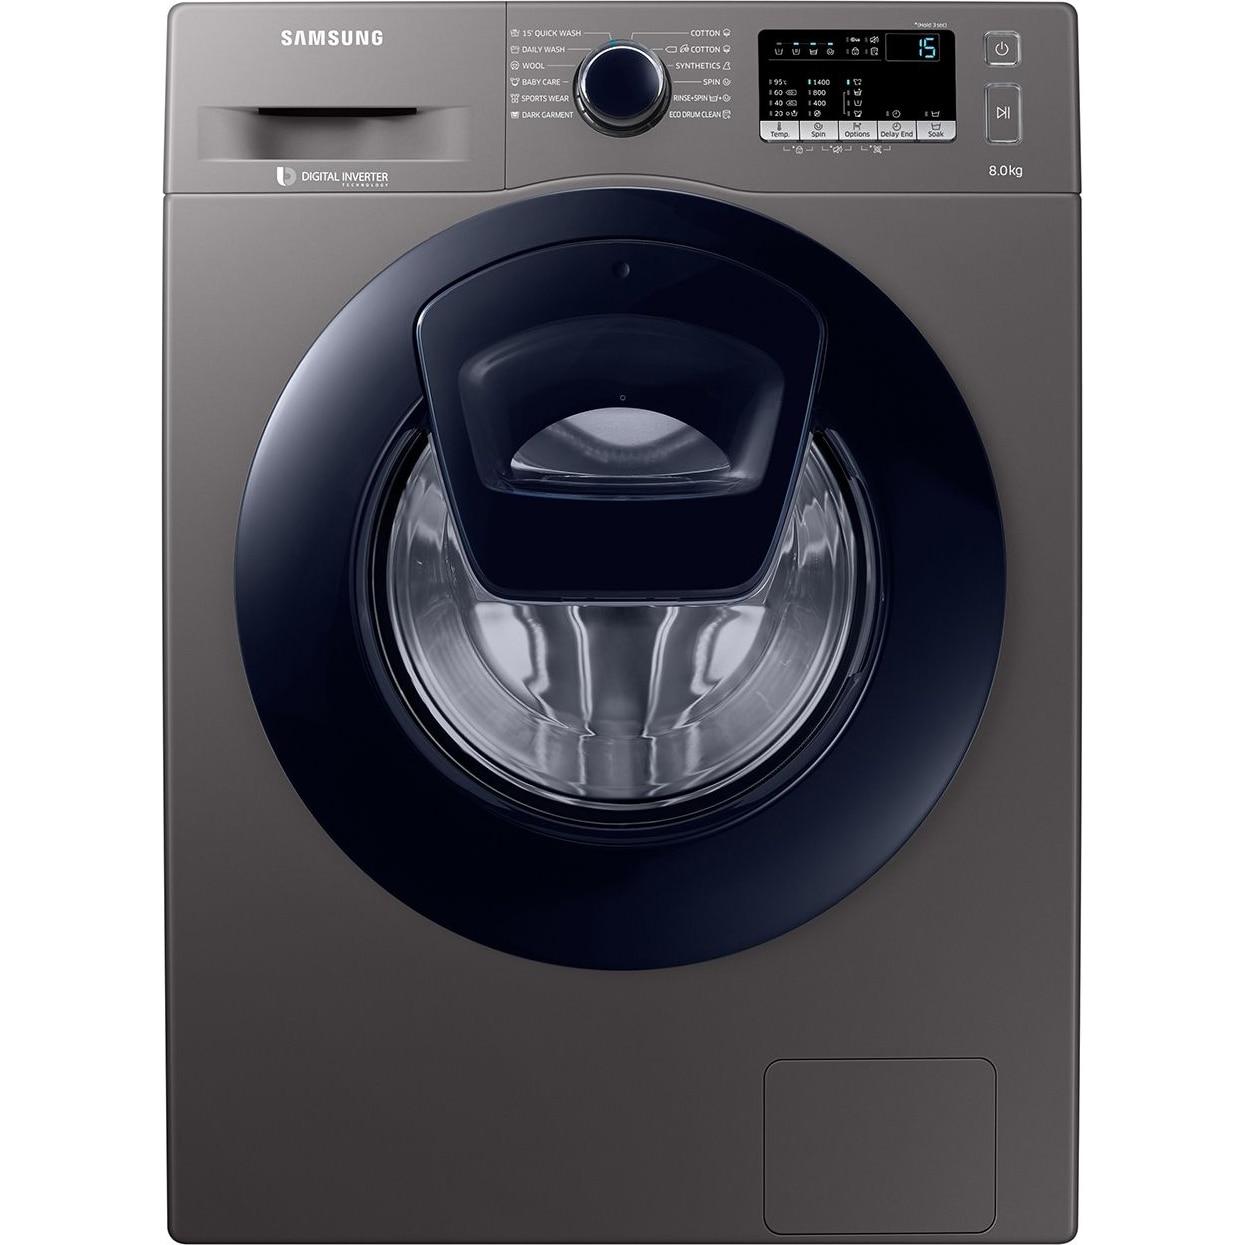 Fotografie Masina de spalat rufe Samsung Add Wash WW80K44305X/LE, 8 kg, 1400 RPM, Clasa A+++, Motor Digital Inverter, Display LED, Smart Check, Inox